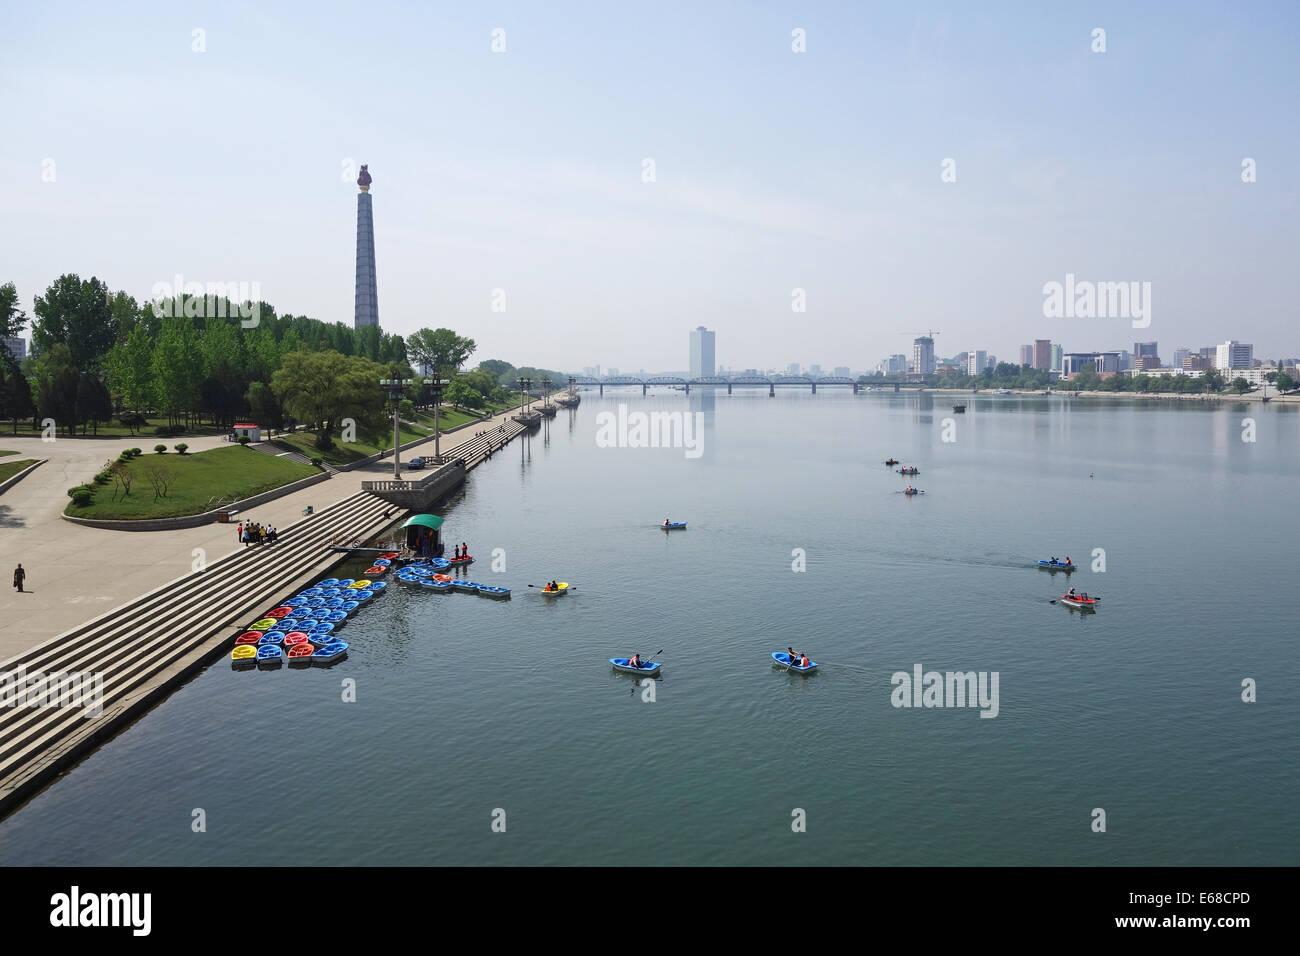 Taedong River, Pyongyang, North Korea - Stock Image